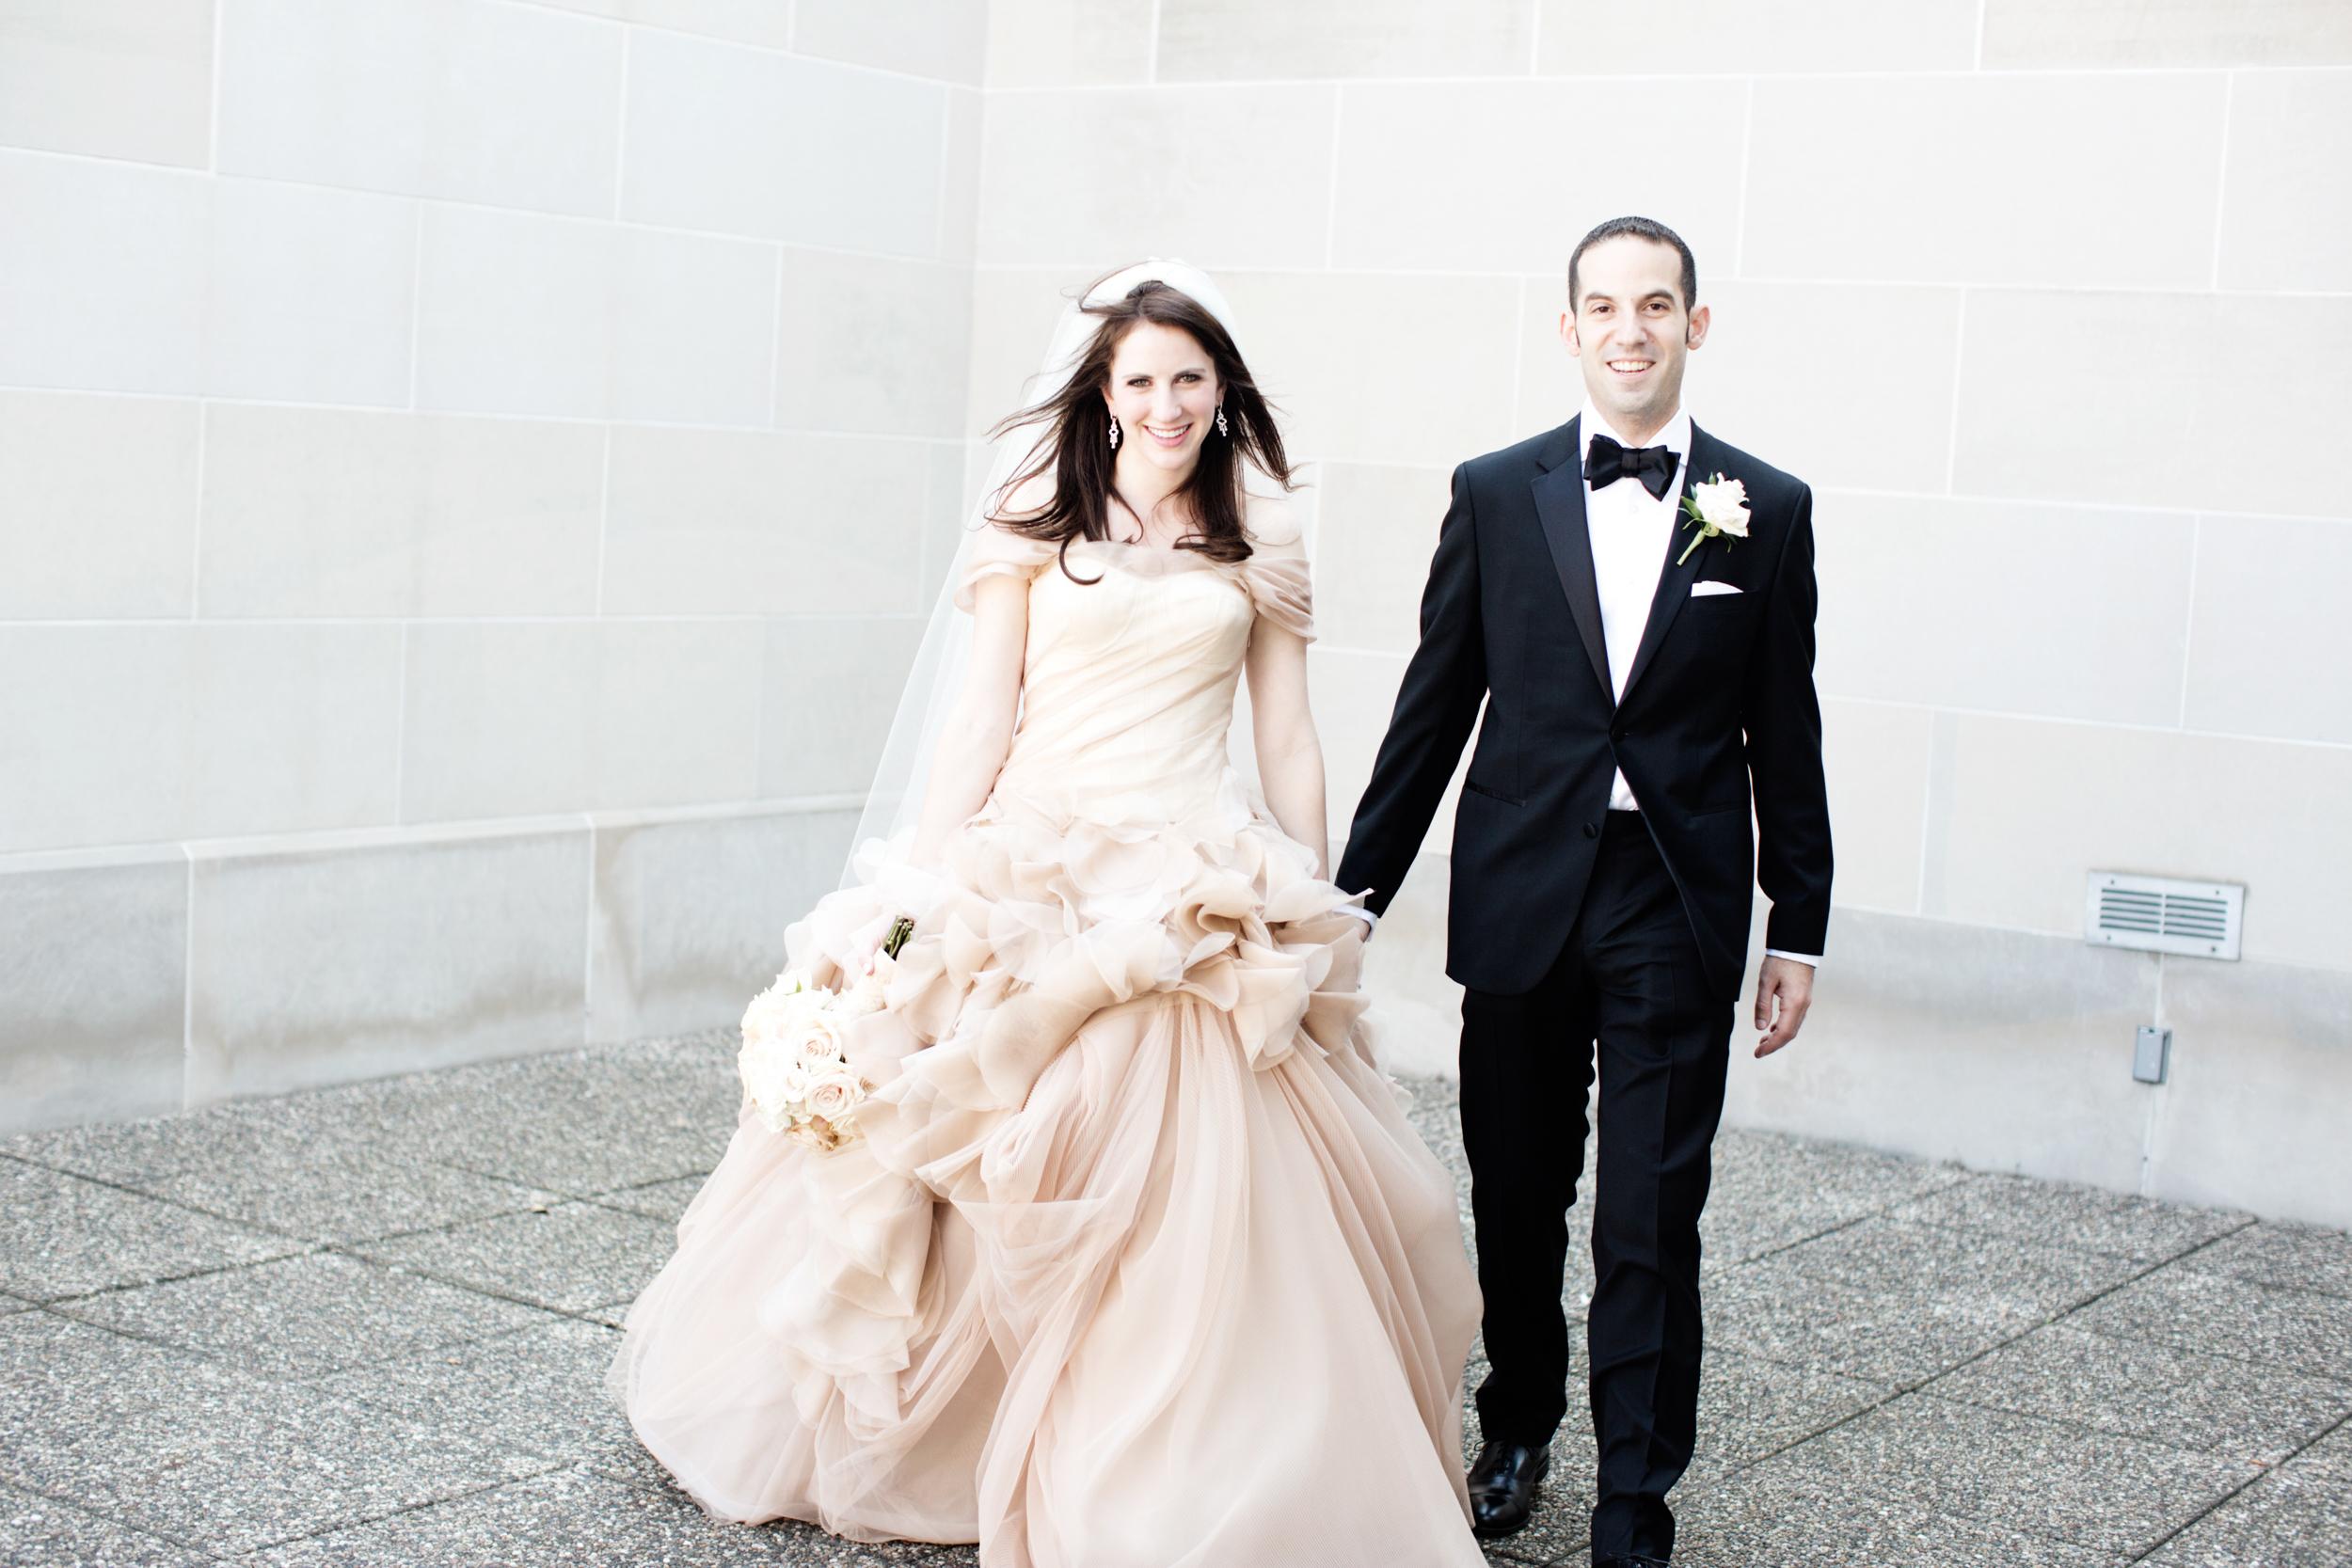 Ceci_New_York_Ceci_Style_Ceci_Johnson_Luxury_Lifestyle_Floral_Lace_Wedding_Letterpress_Inspiration_Design_Custom_Couture_Personalized_Invitations_-100.jpg